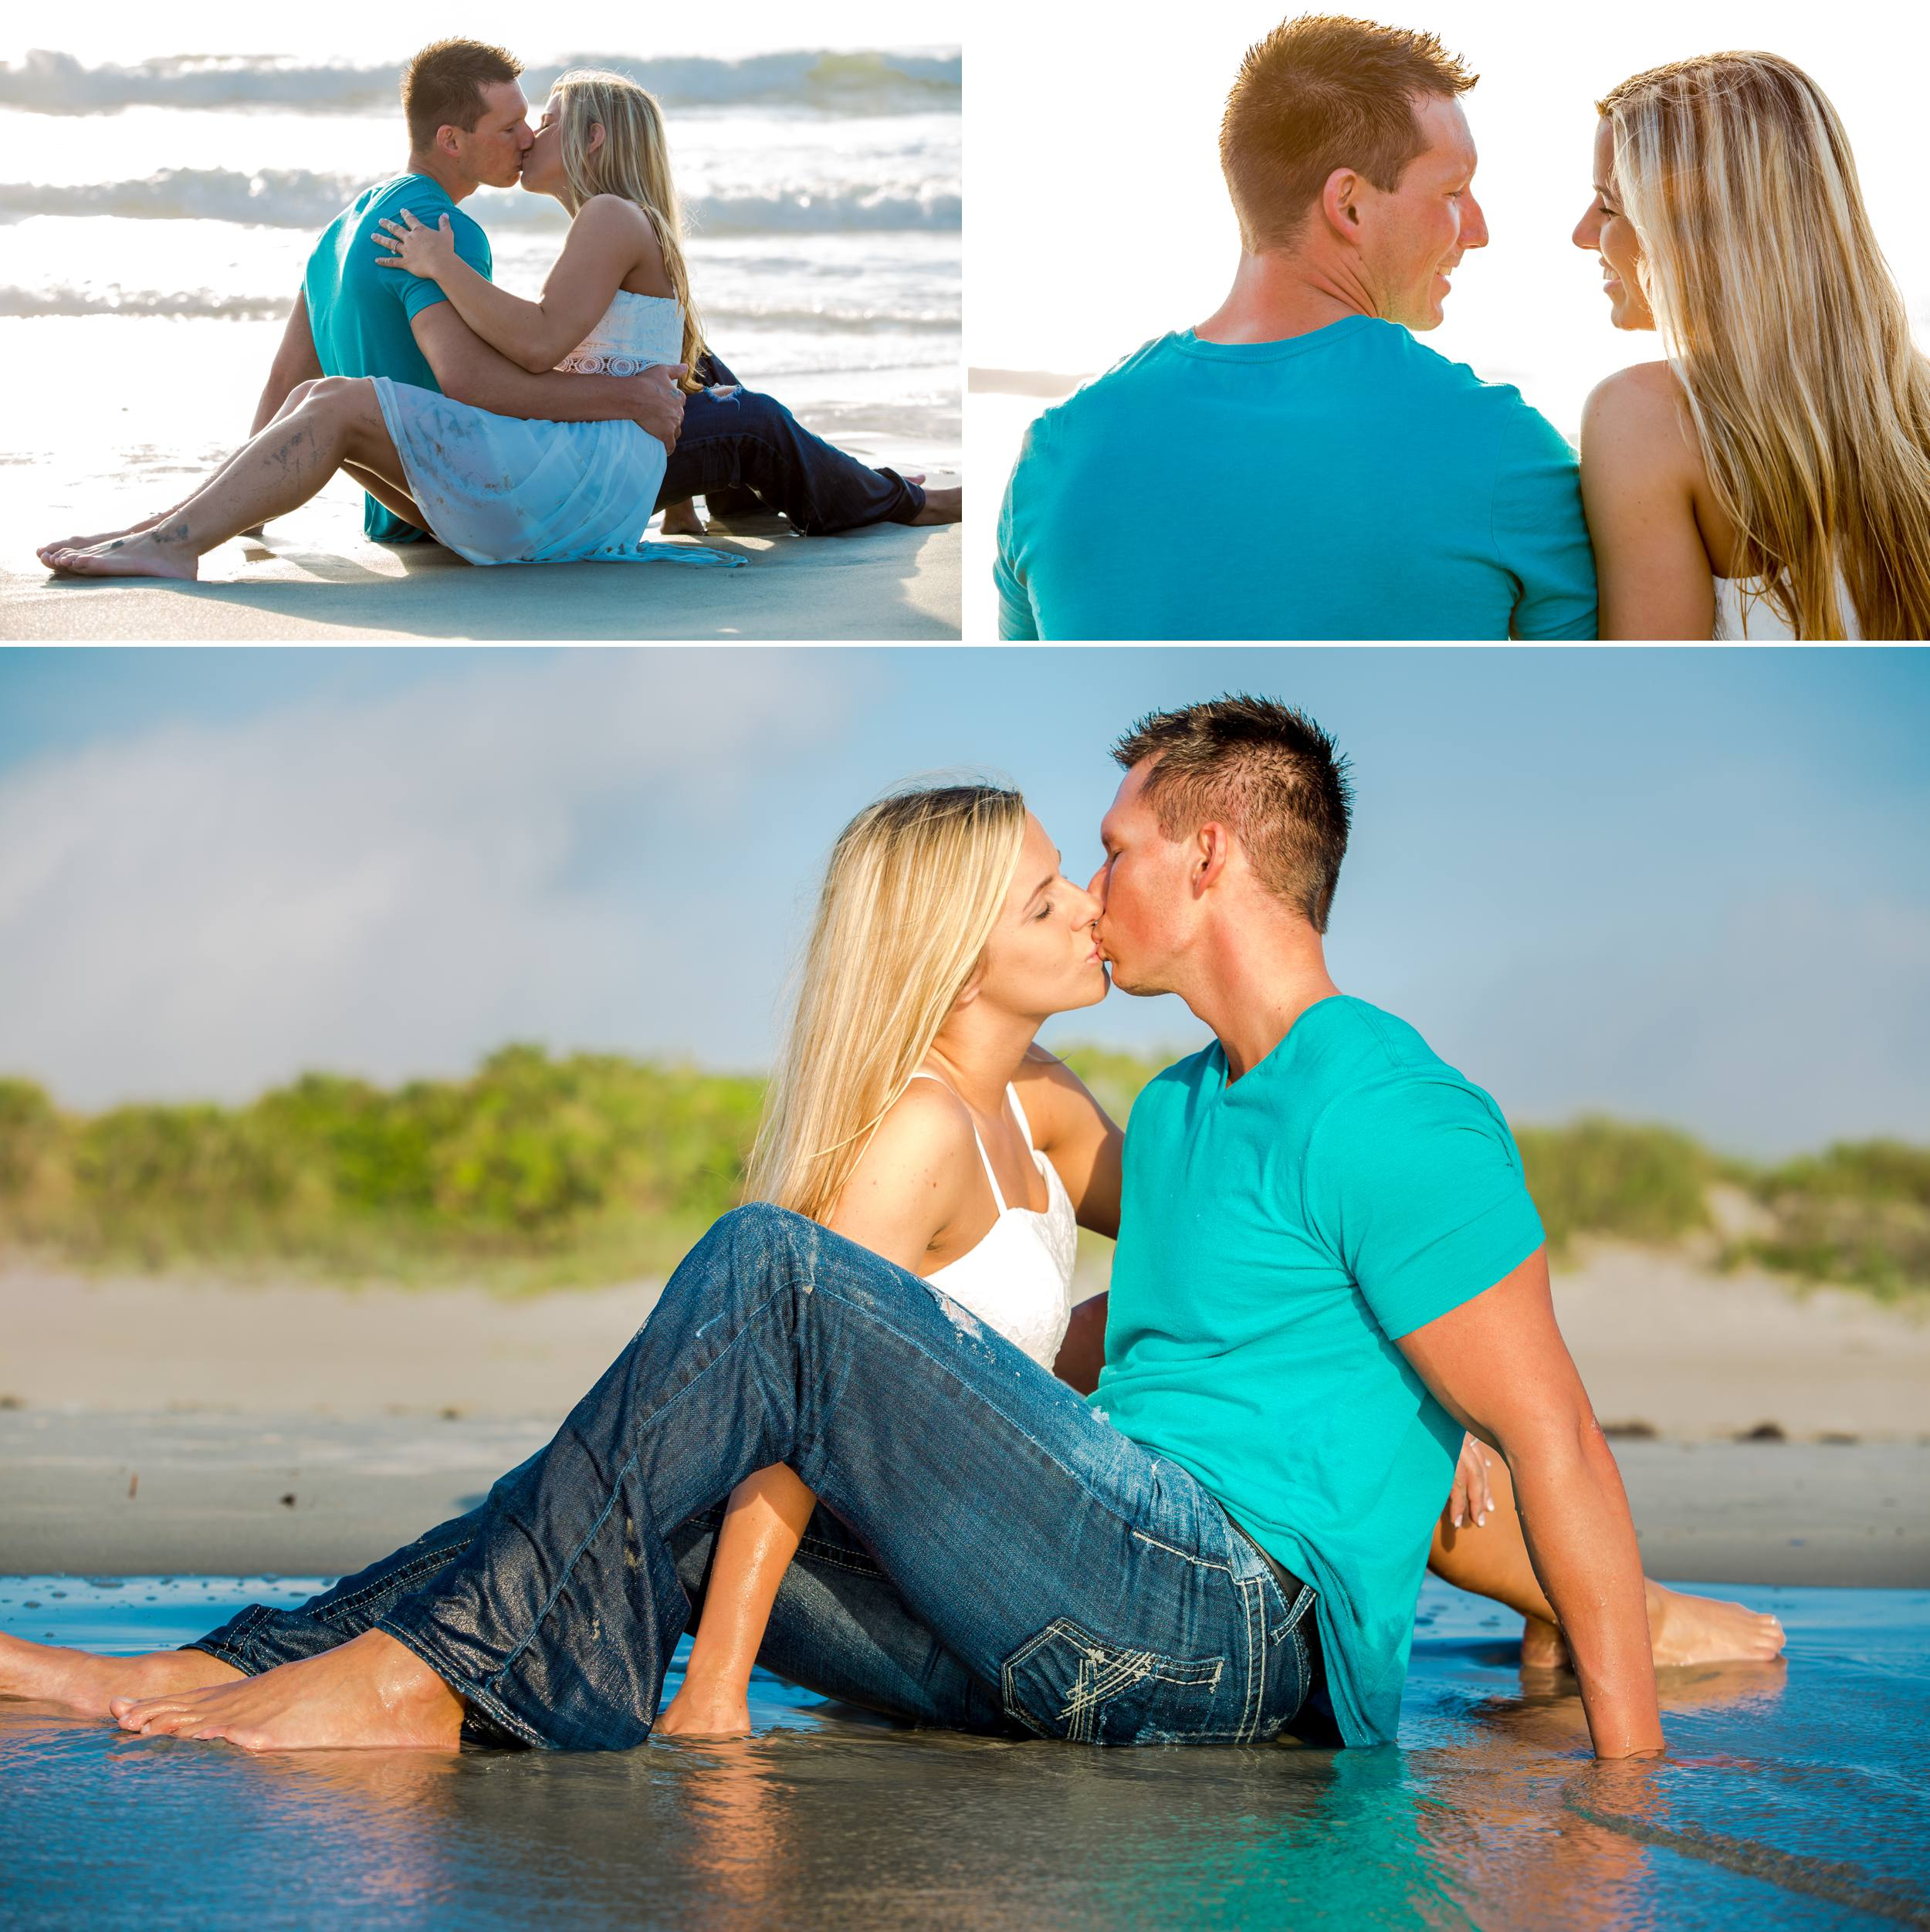 Lori Wilson Park Cocoa Beach Sunrise Engagement Session Mint Green dress- Bri 14.jpg